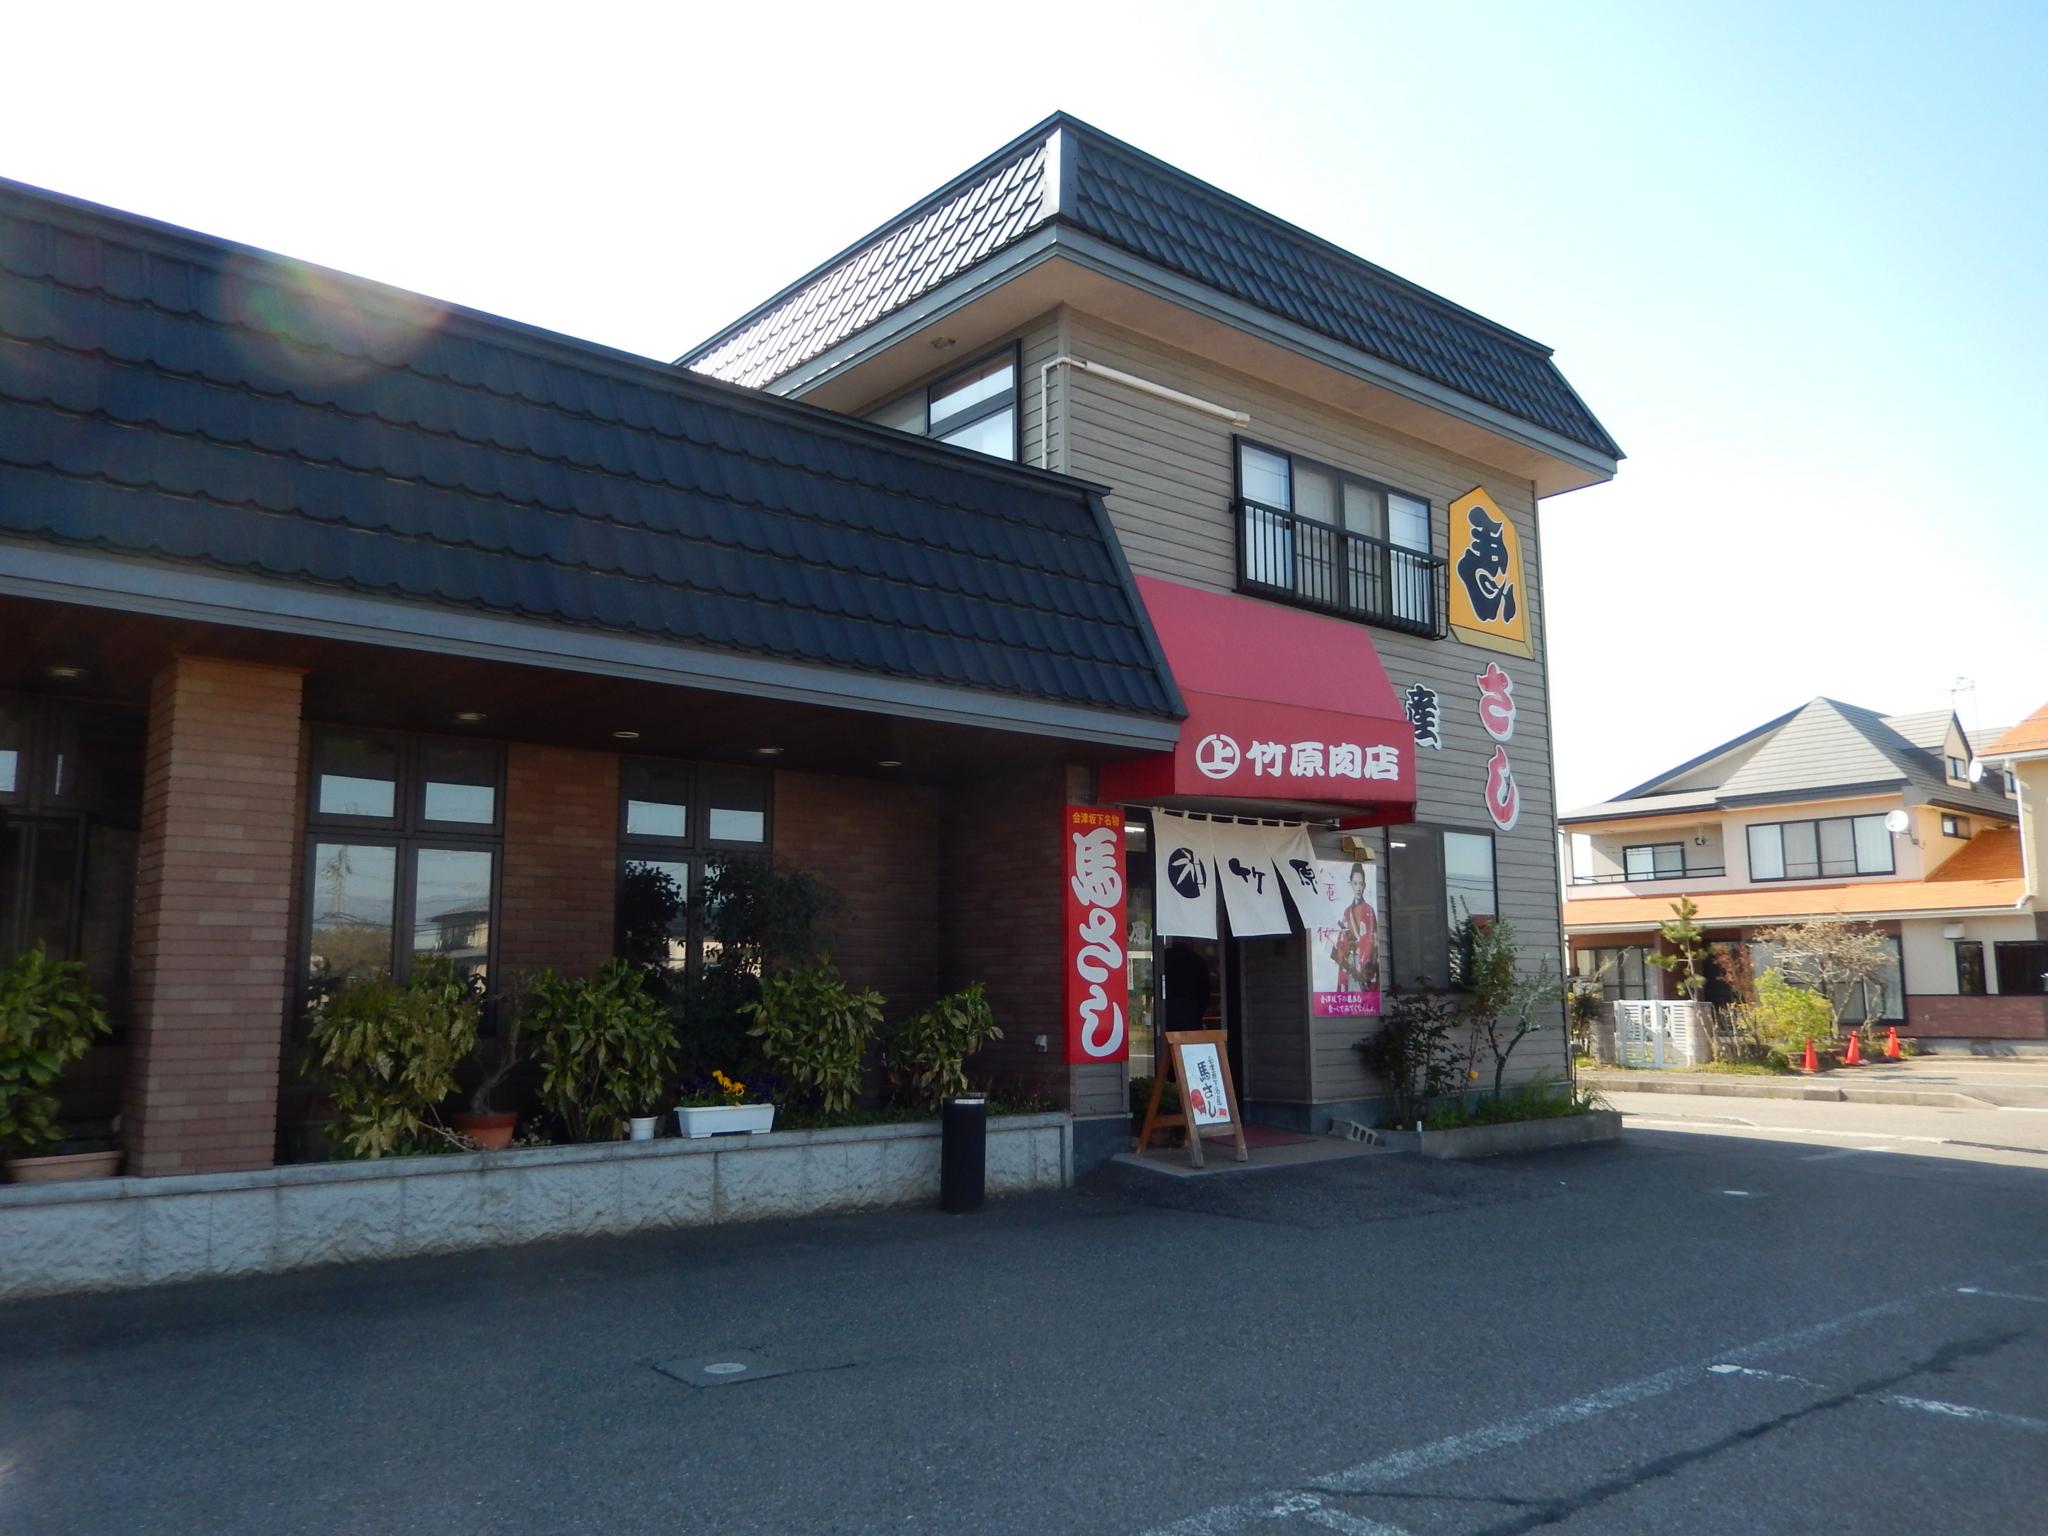 f:id:ToshUeno:20150426150808j:plain